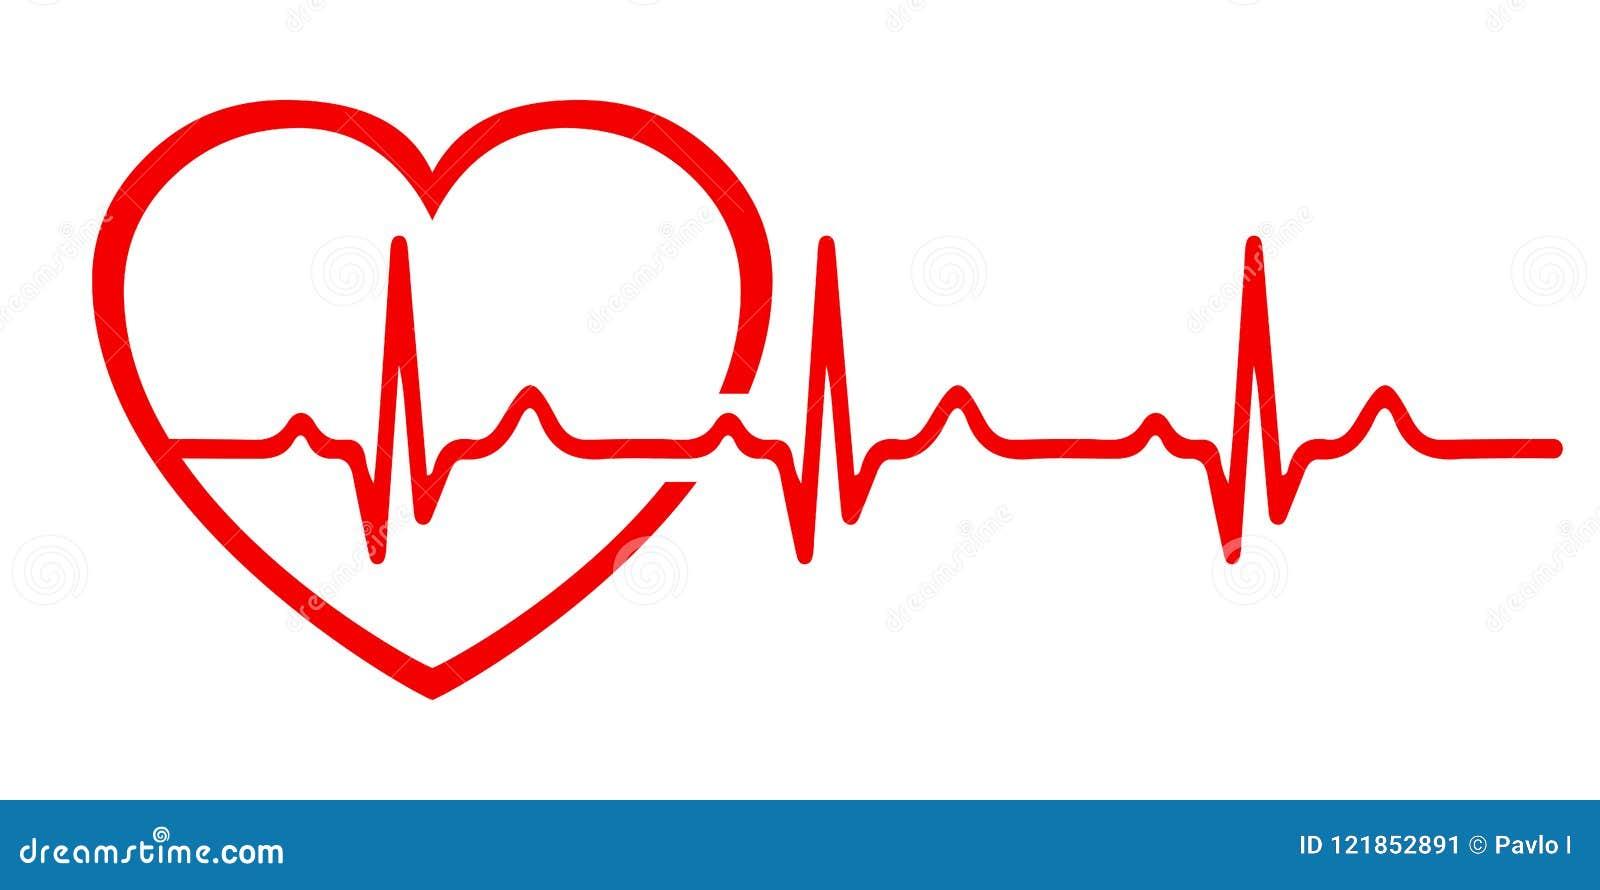 Heart Pulse, One Line, Cardiogram Sign, Heartbeat - Vector ...